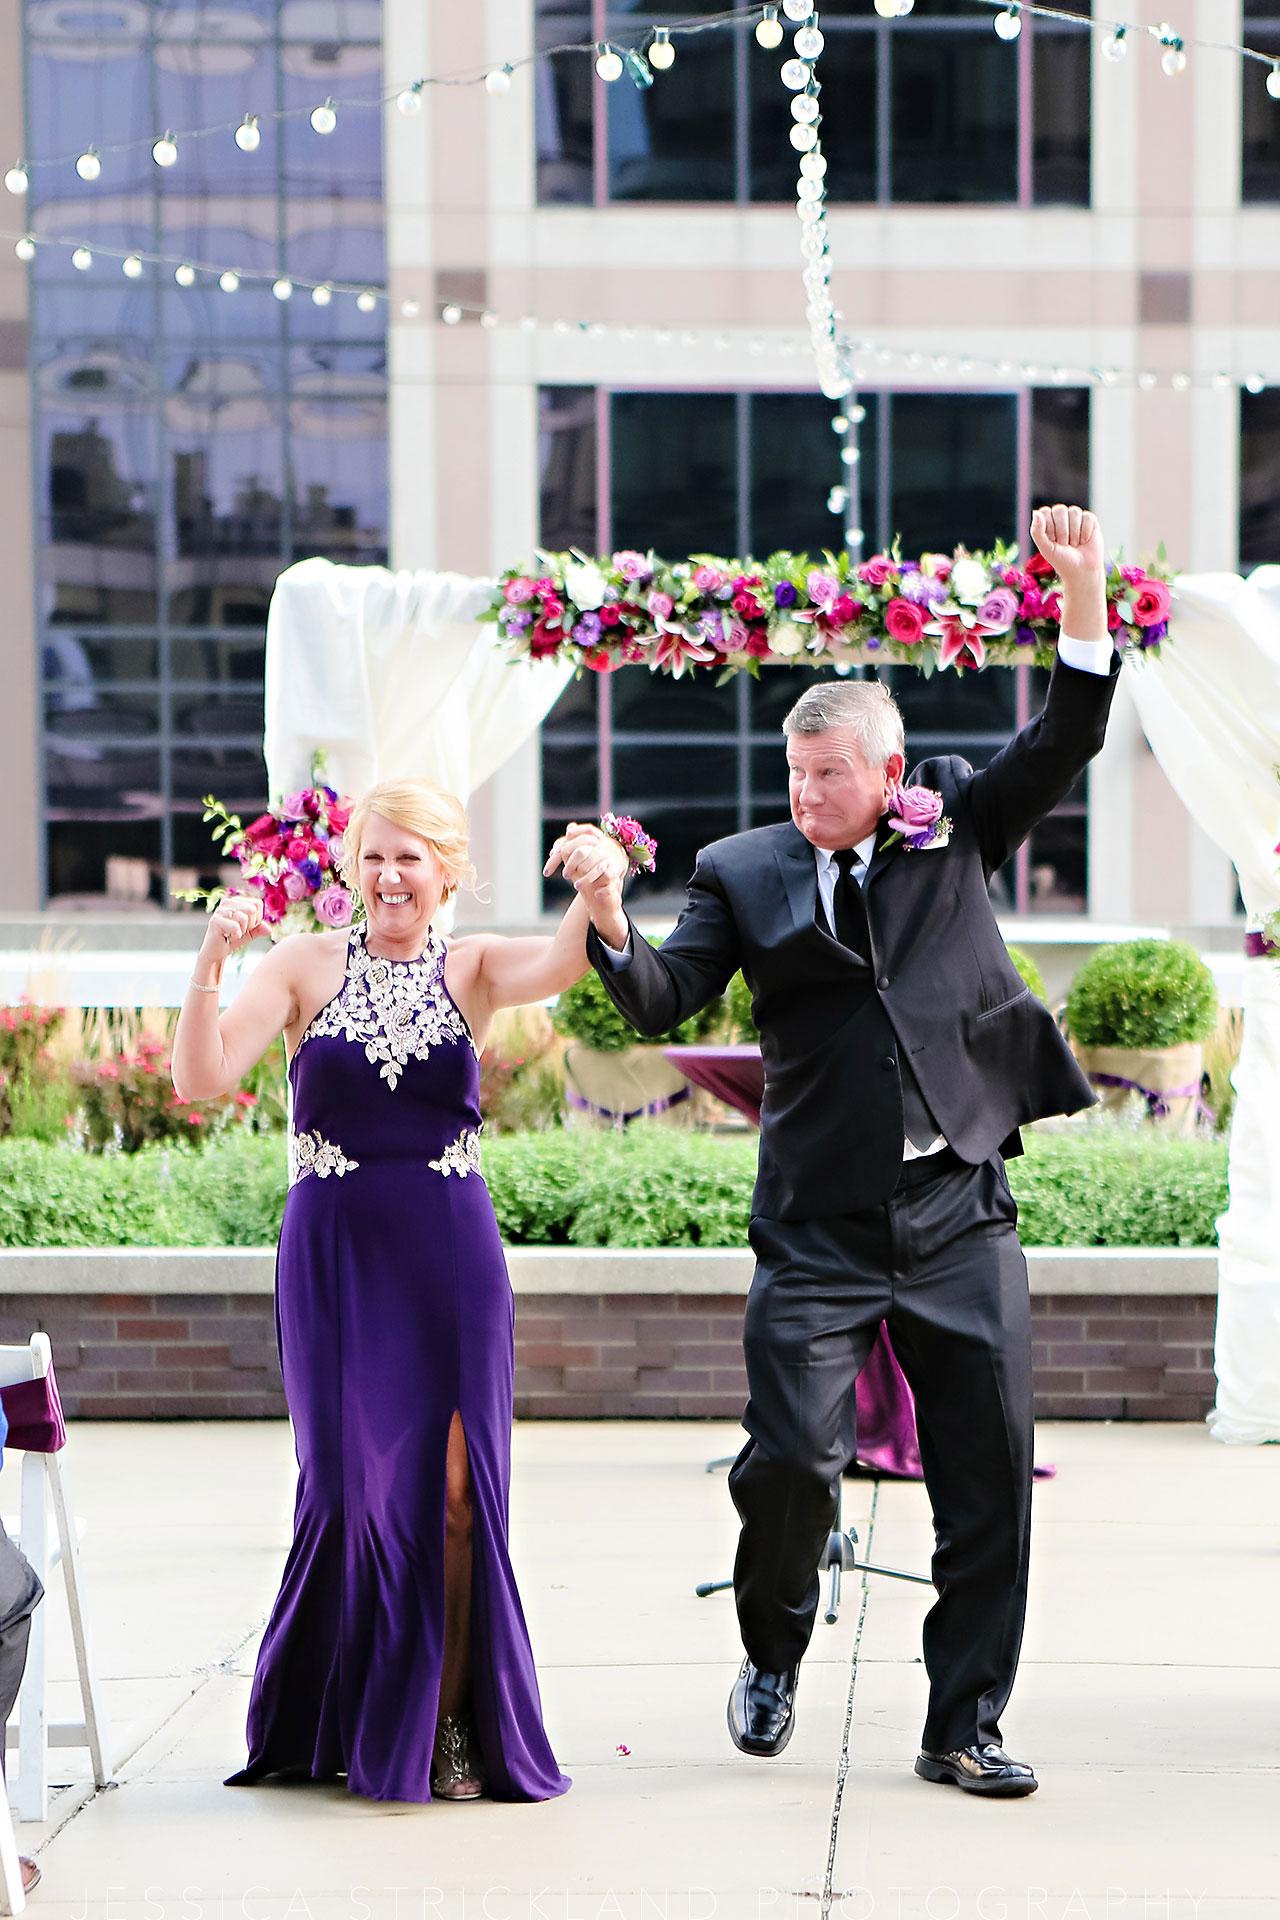 Serra Alex Regions Tower Indianapolis Wedding 177 watermarked